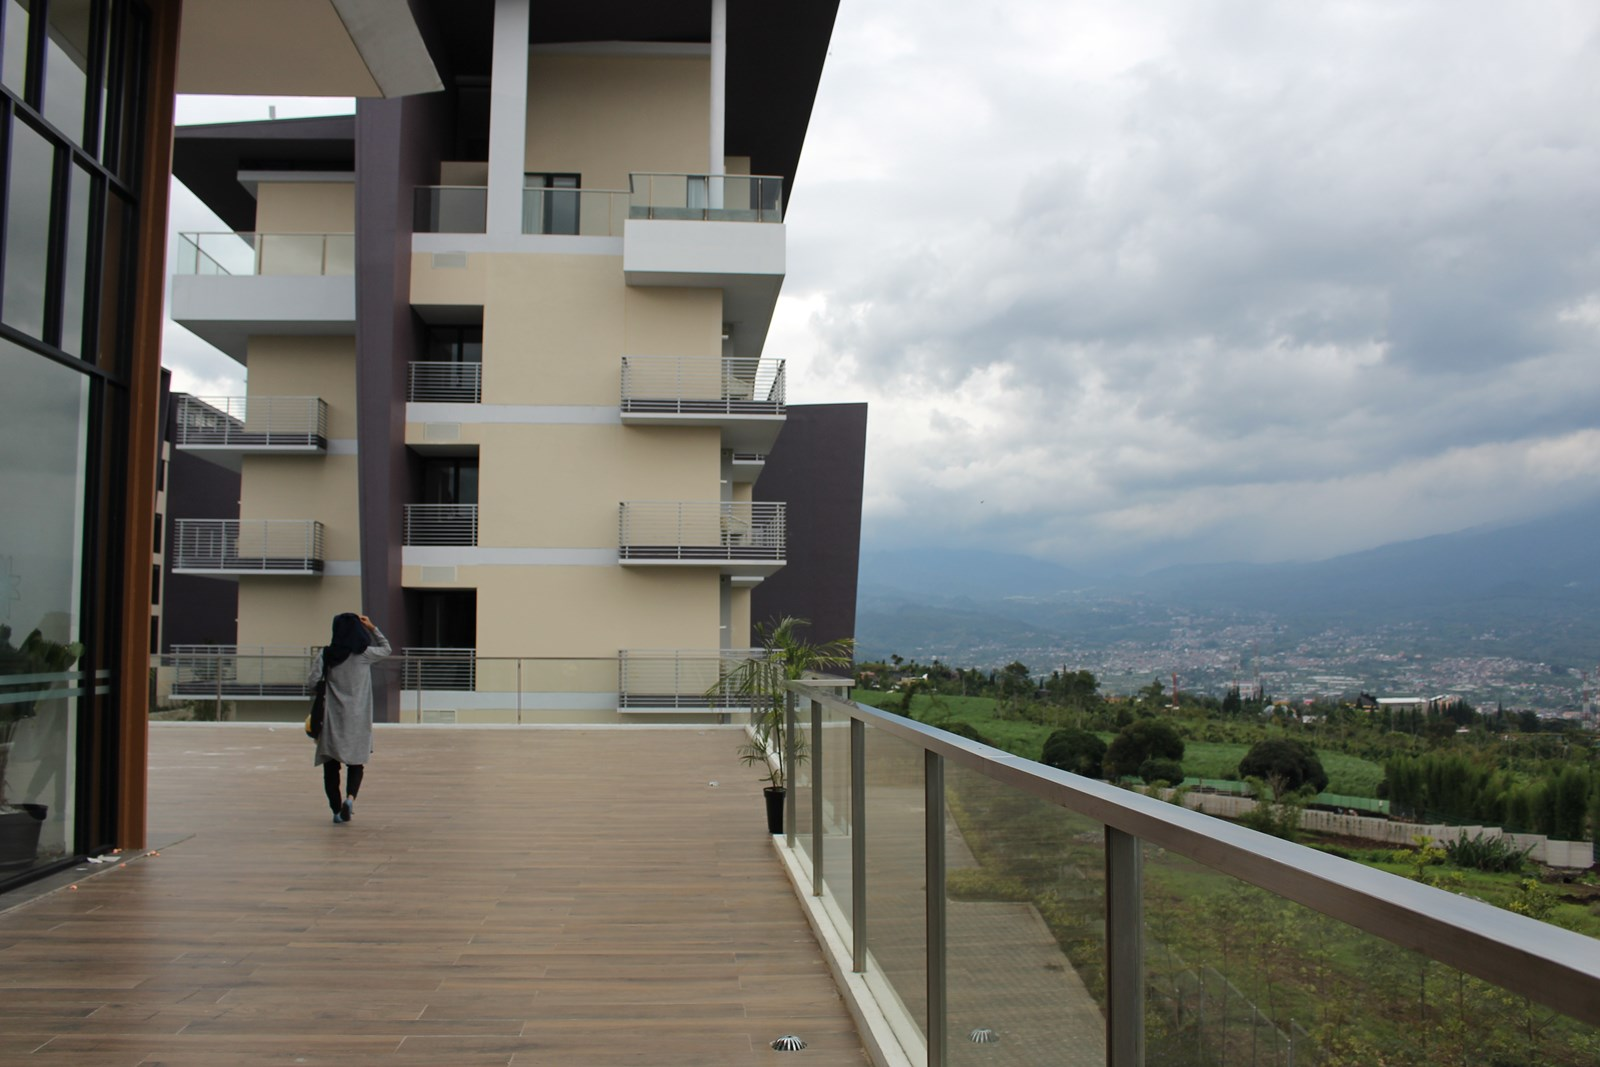 Golden Tulip Hollad Resort Batu Hotel Dengan Pemandangan Gunung Voucher Bonus Panderman Photo By Fery